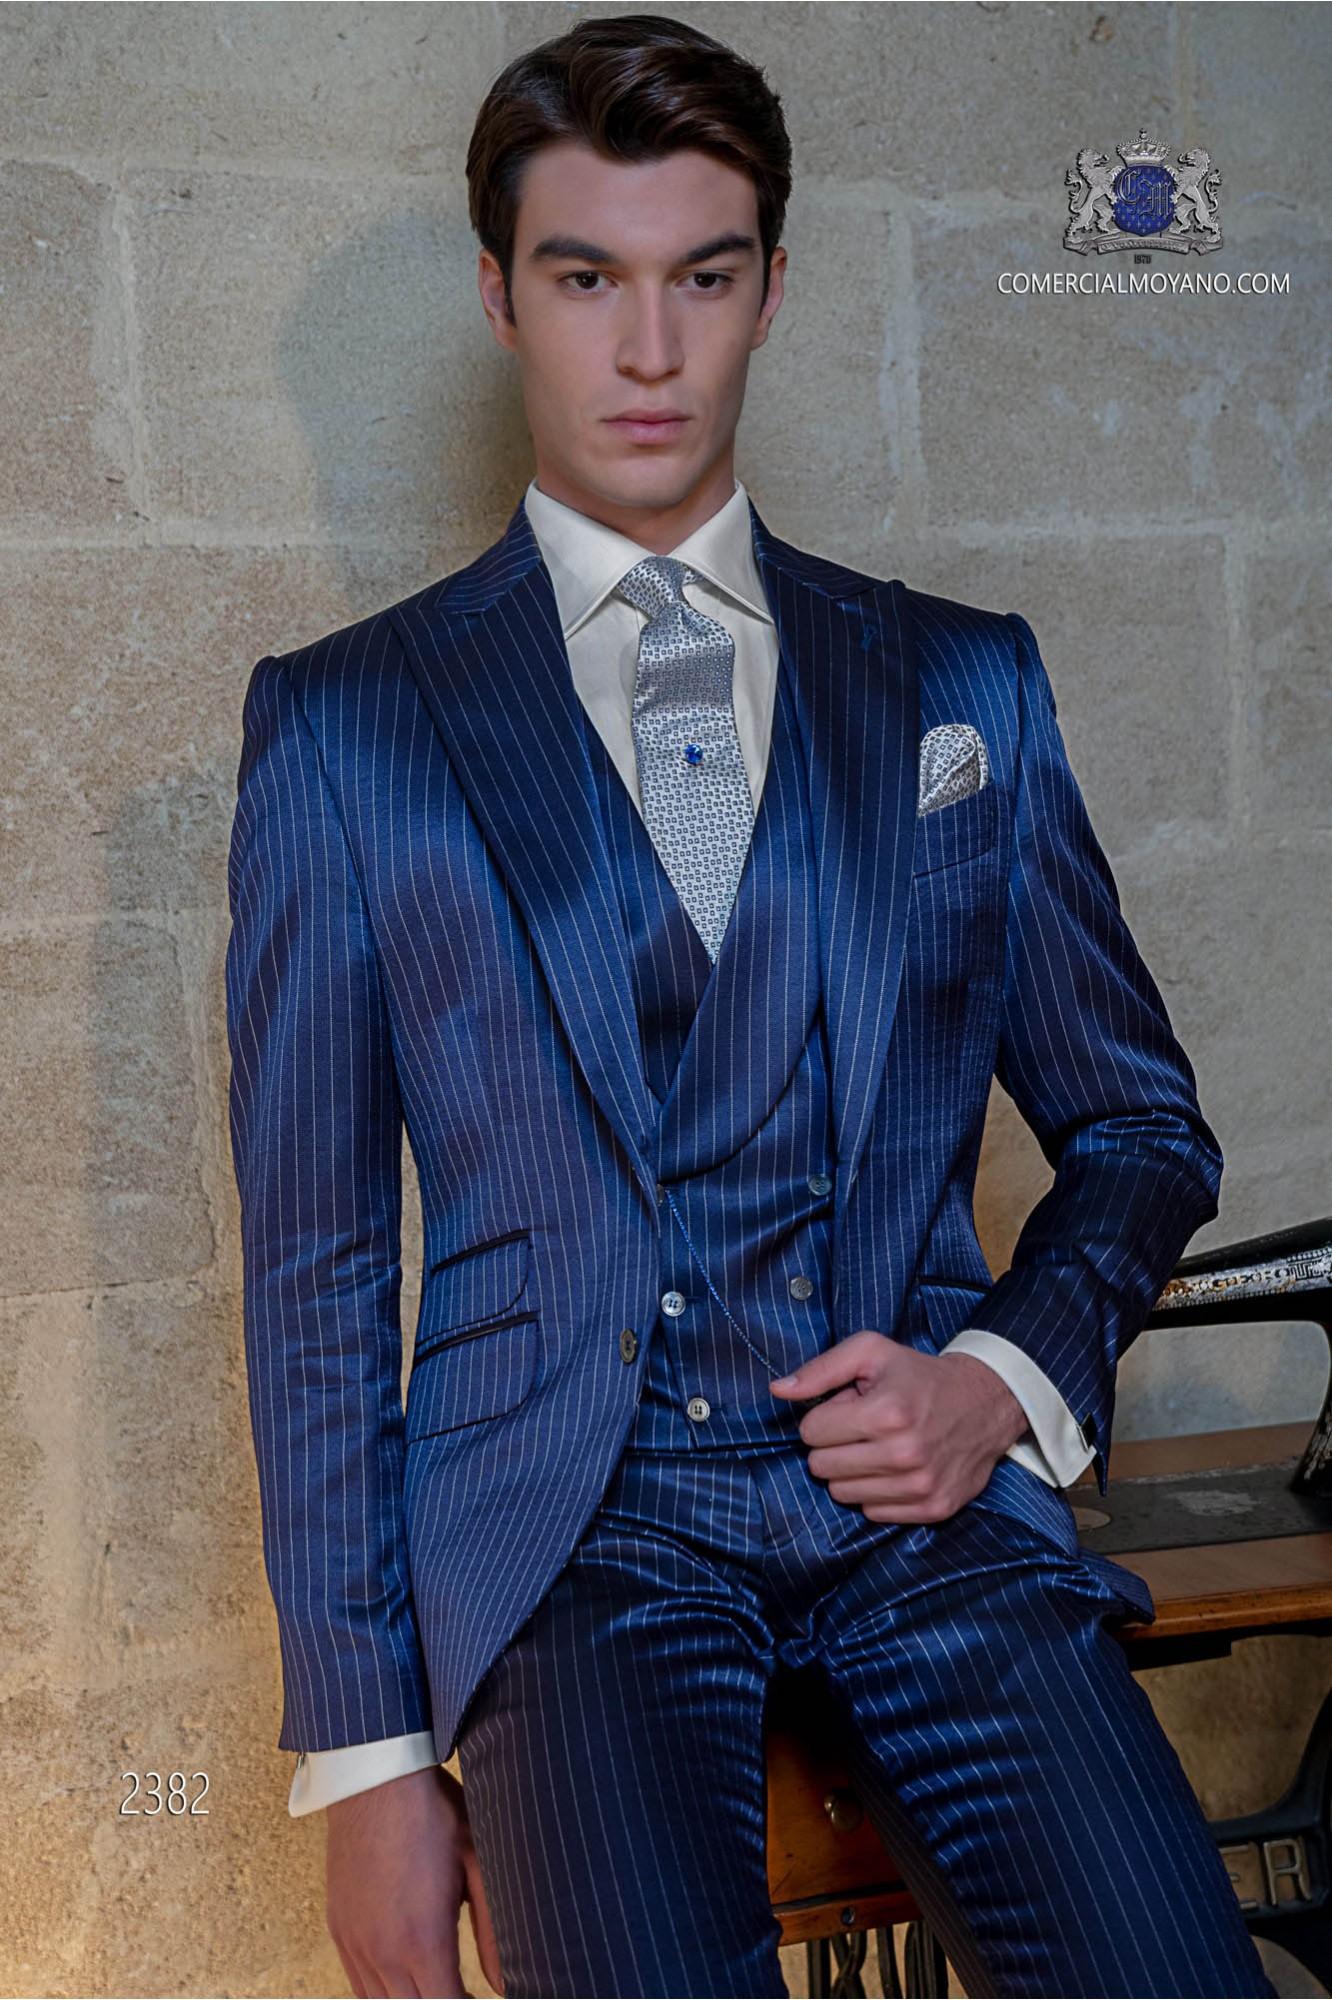 2019 wholesale price original on feet images of Italian bespoke royal blue pinstripe suit